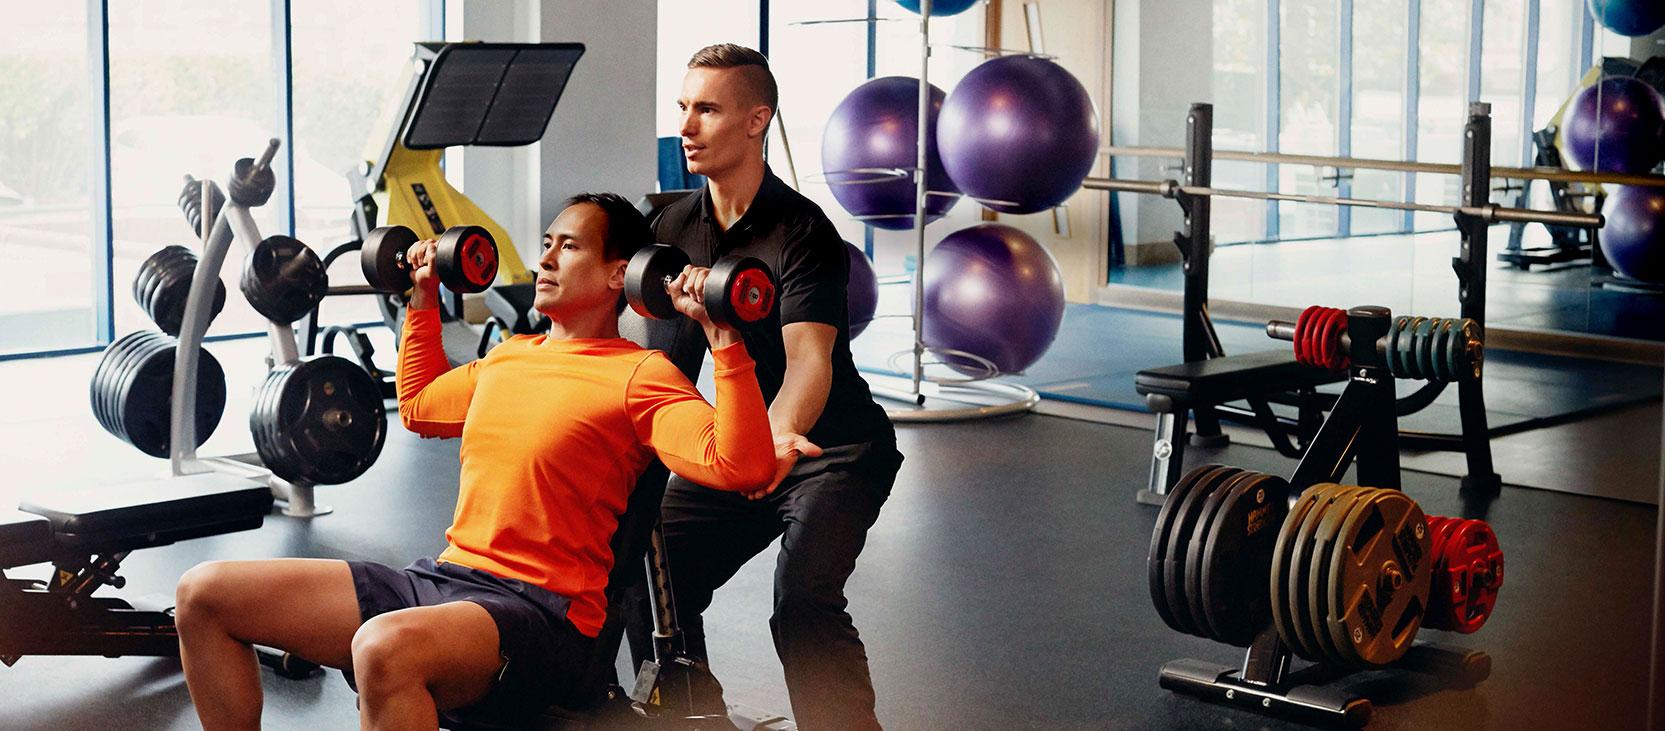 「fitness training」的圖片搜尋結果